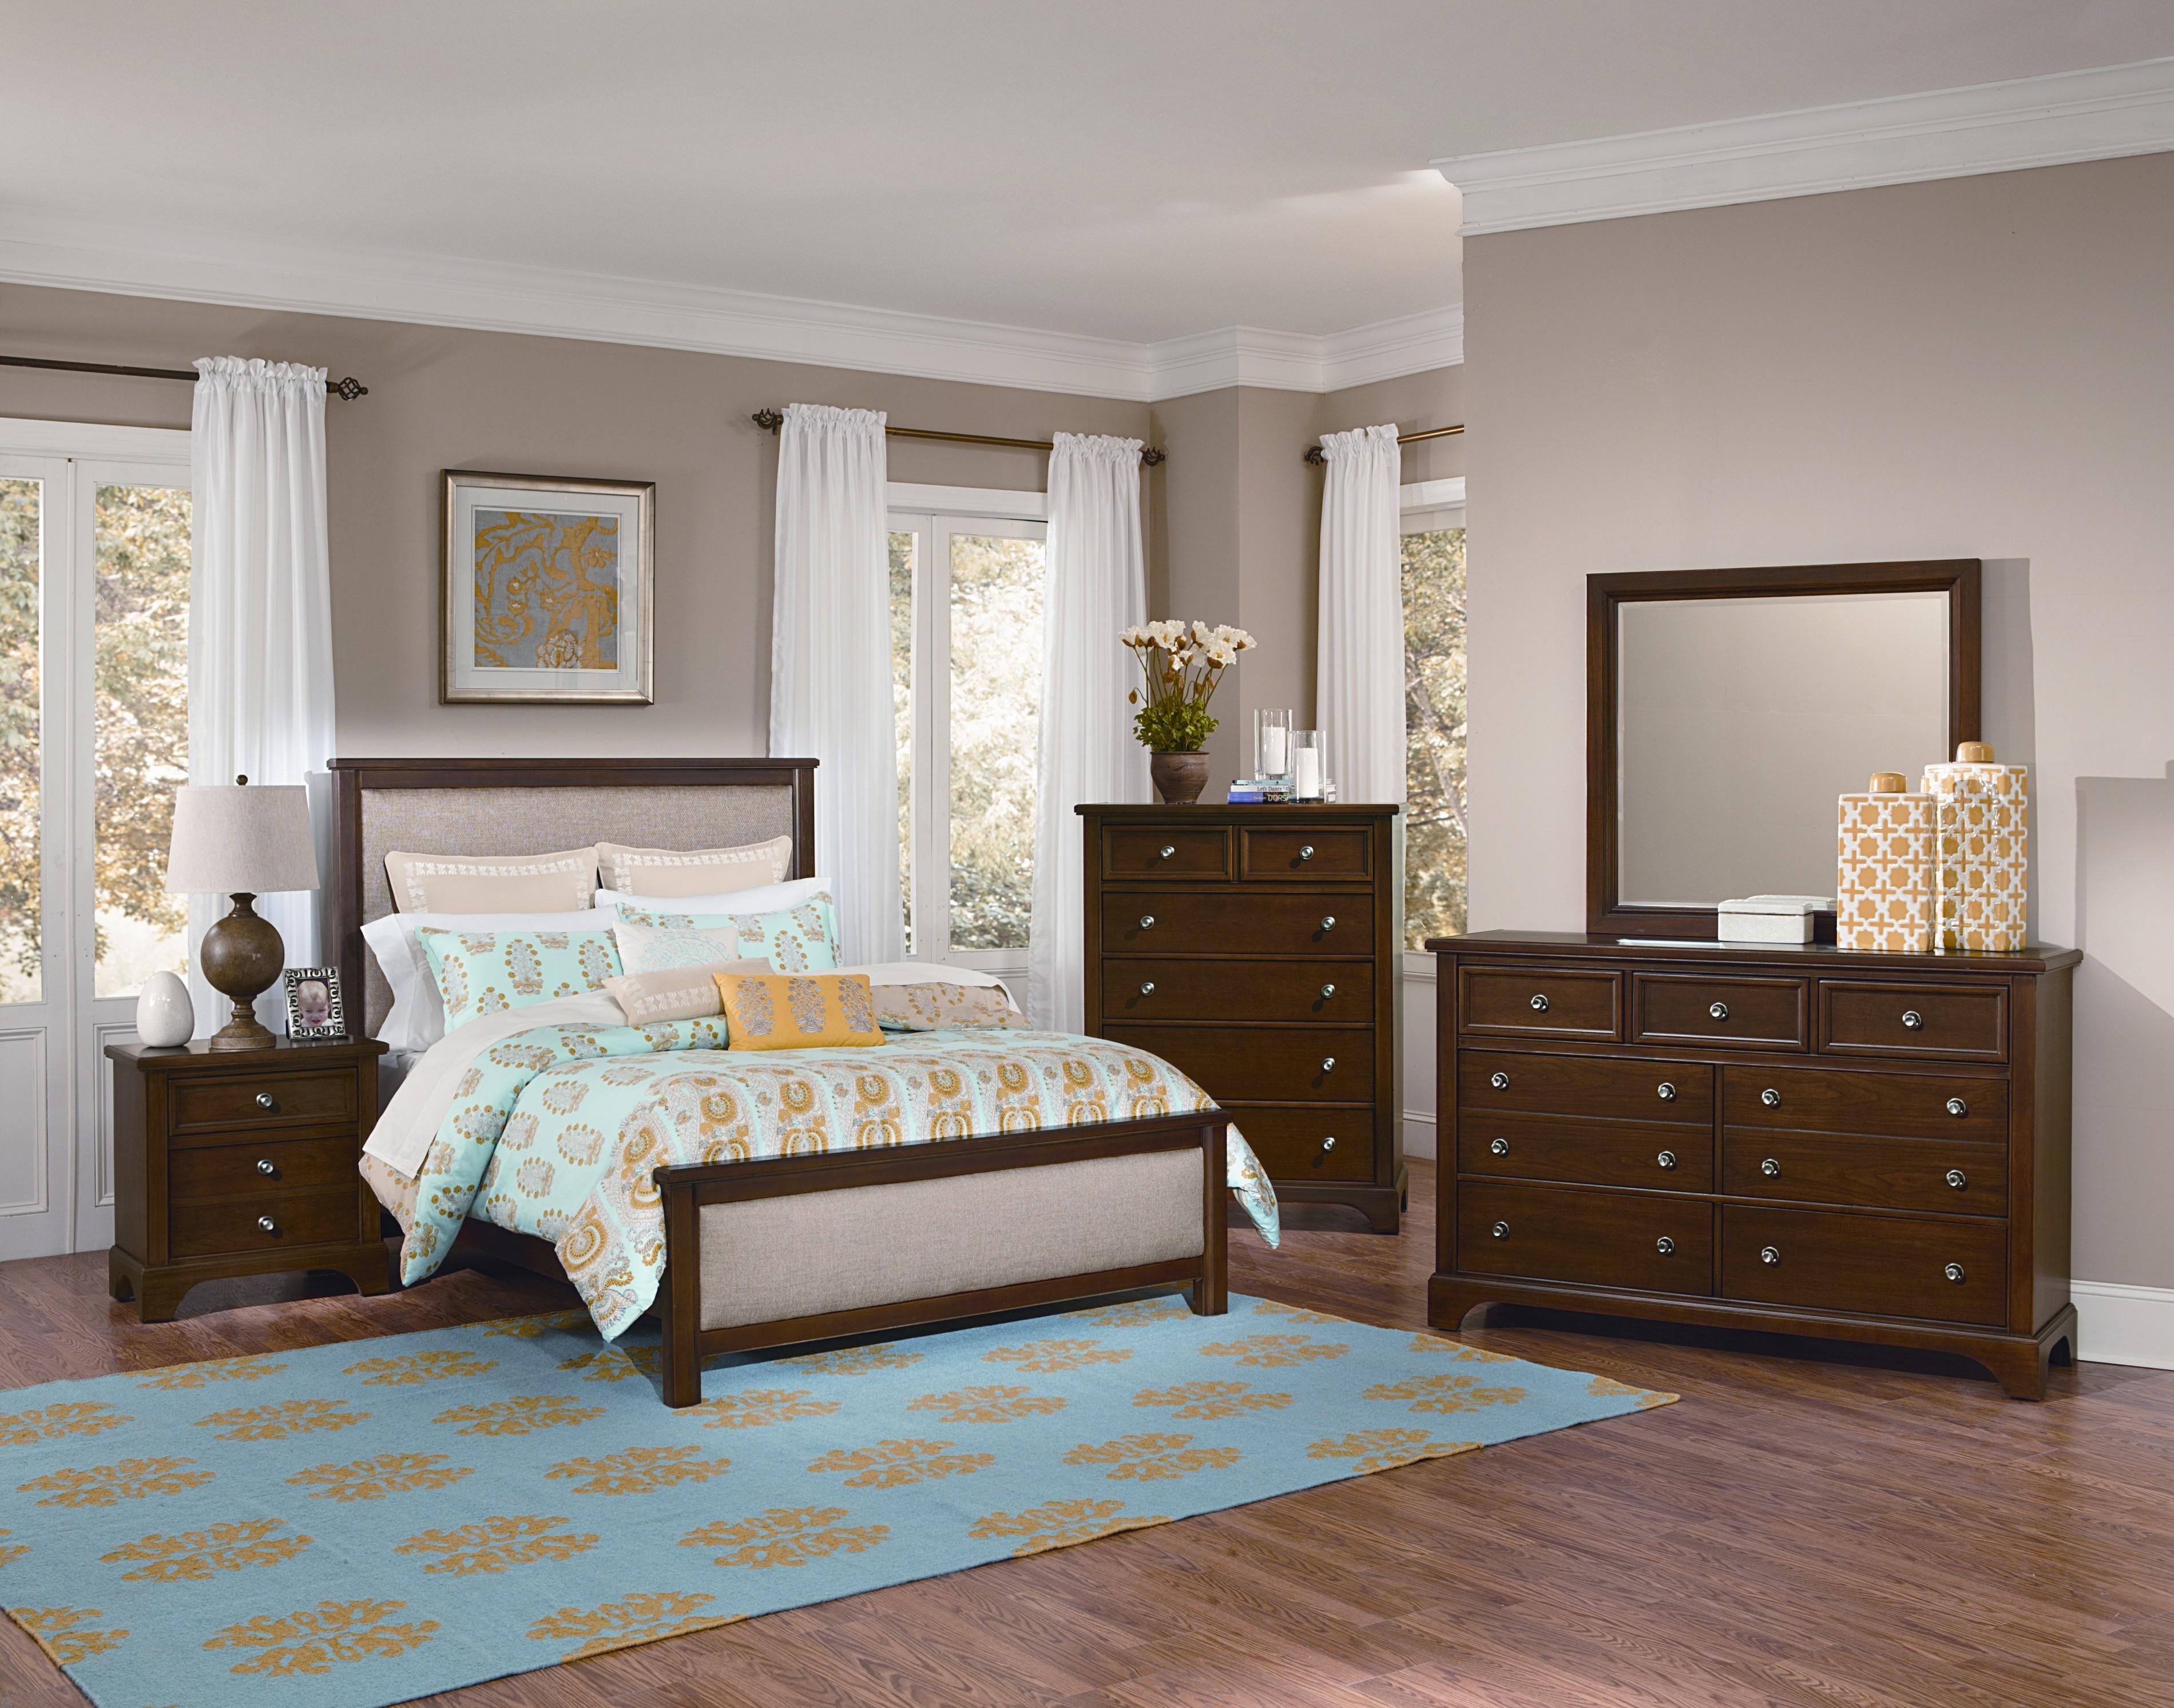 Taylor's Loft King Bedroom Group by Vaughan Bassett